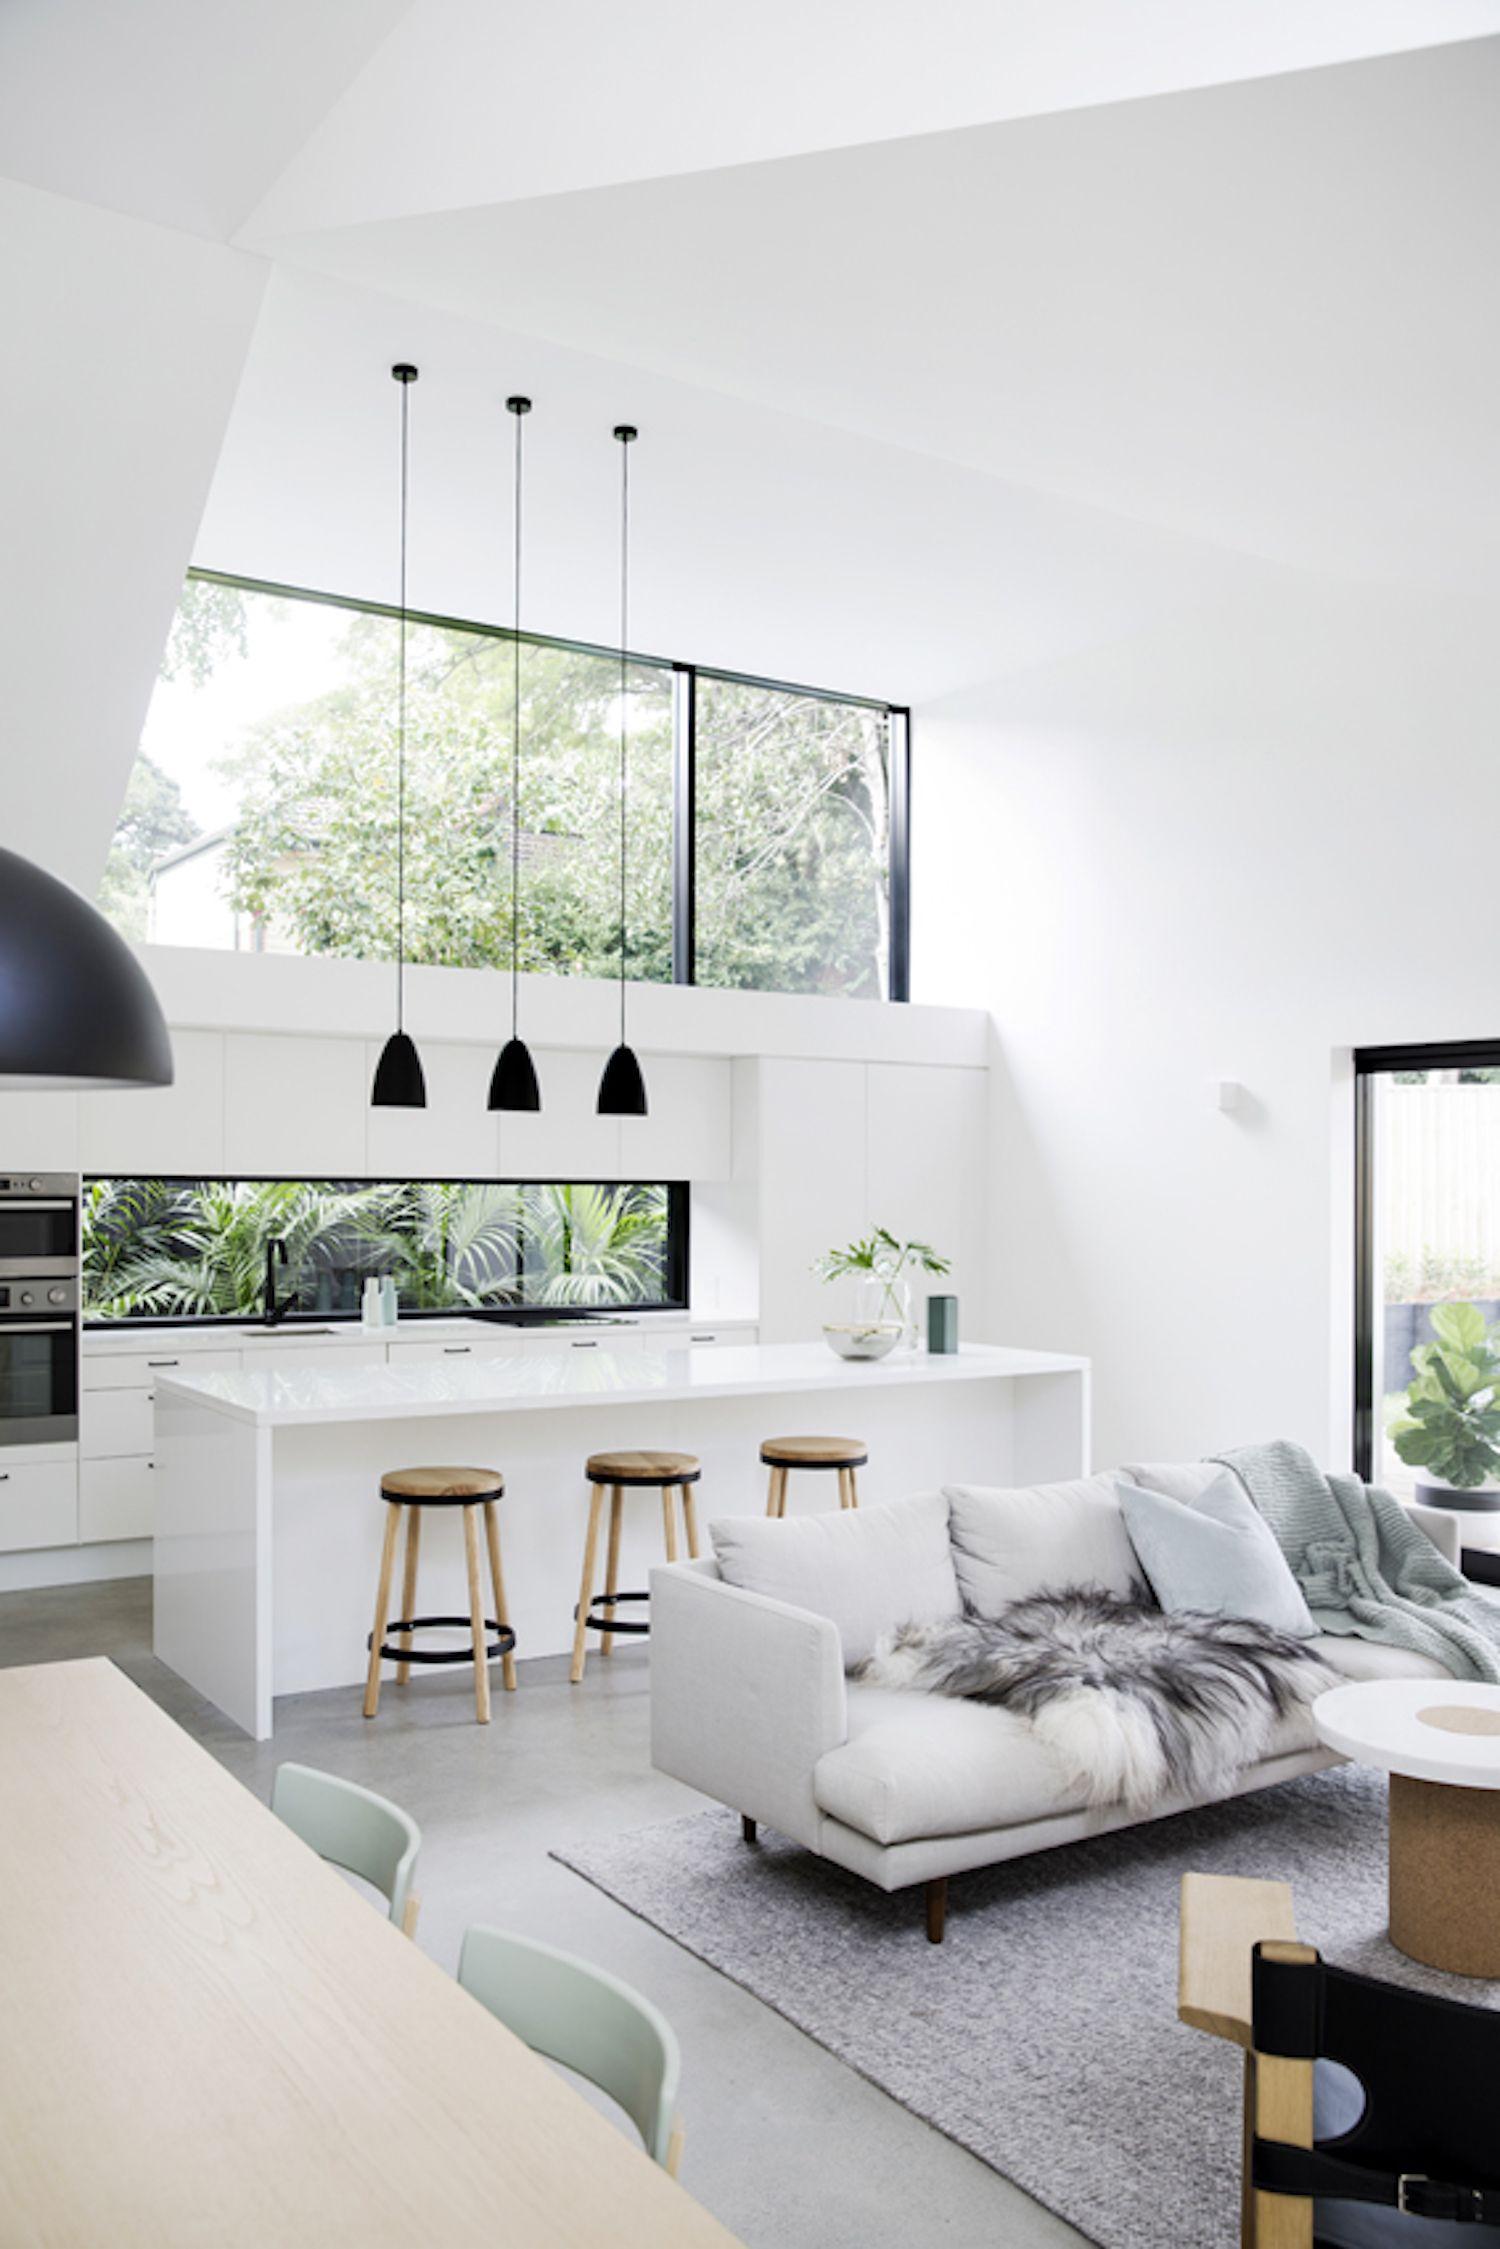 small house interior design allen key house by architect prineas   est living MFIJJER